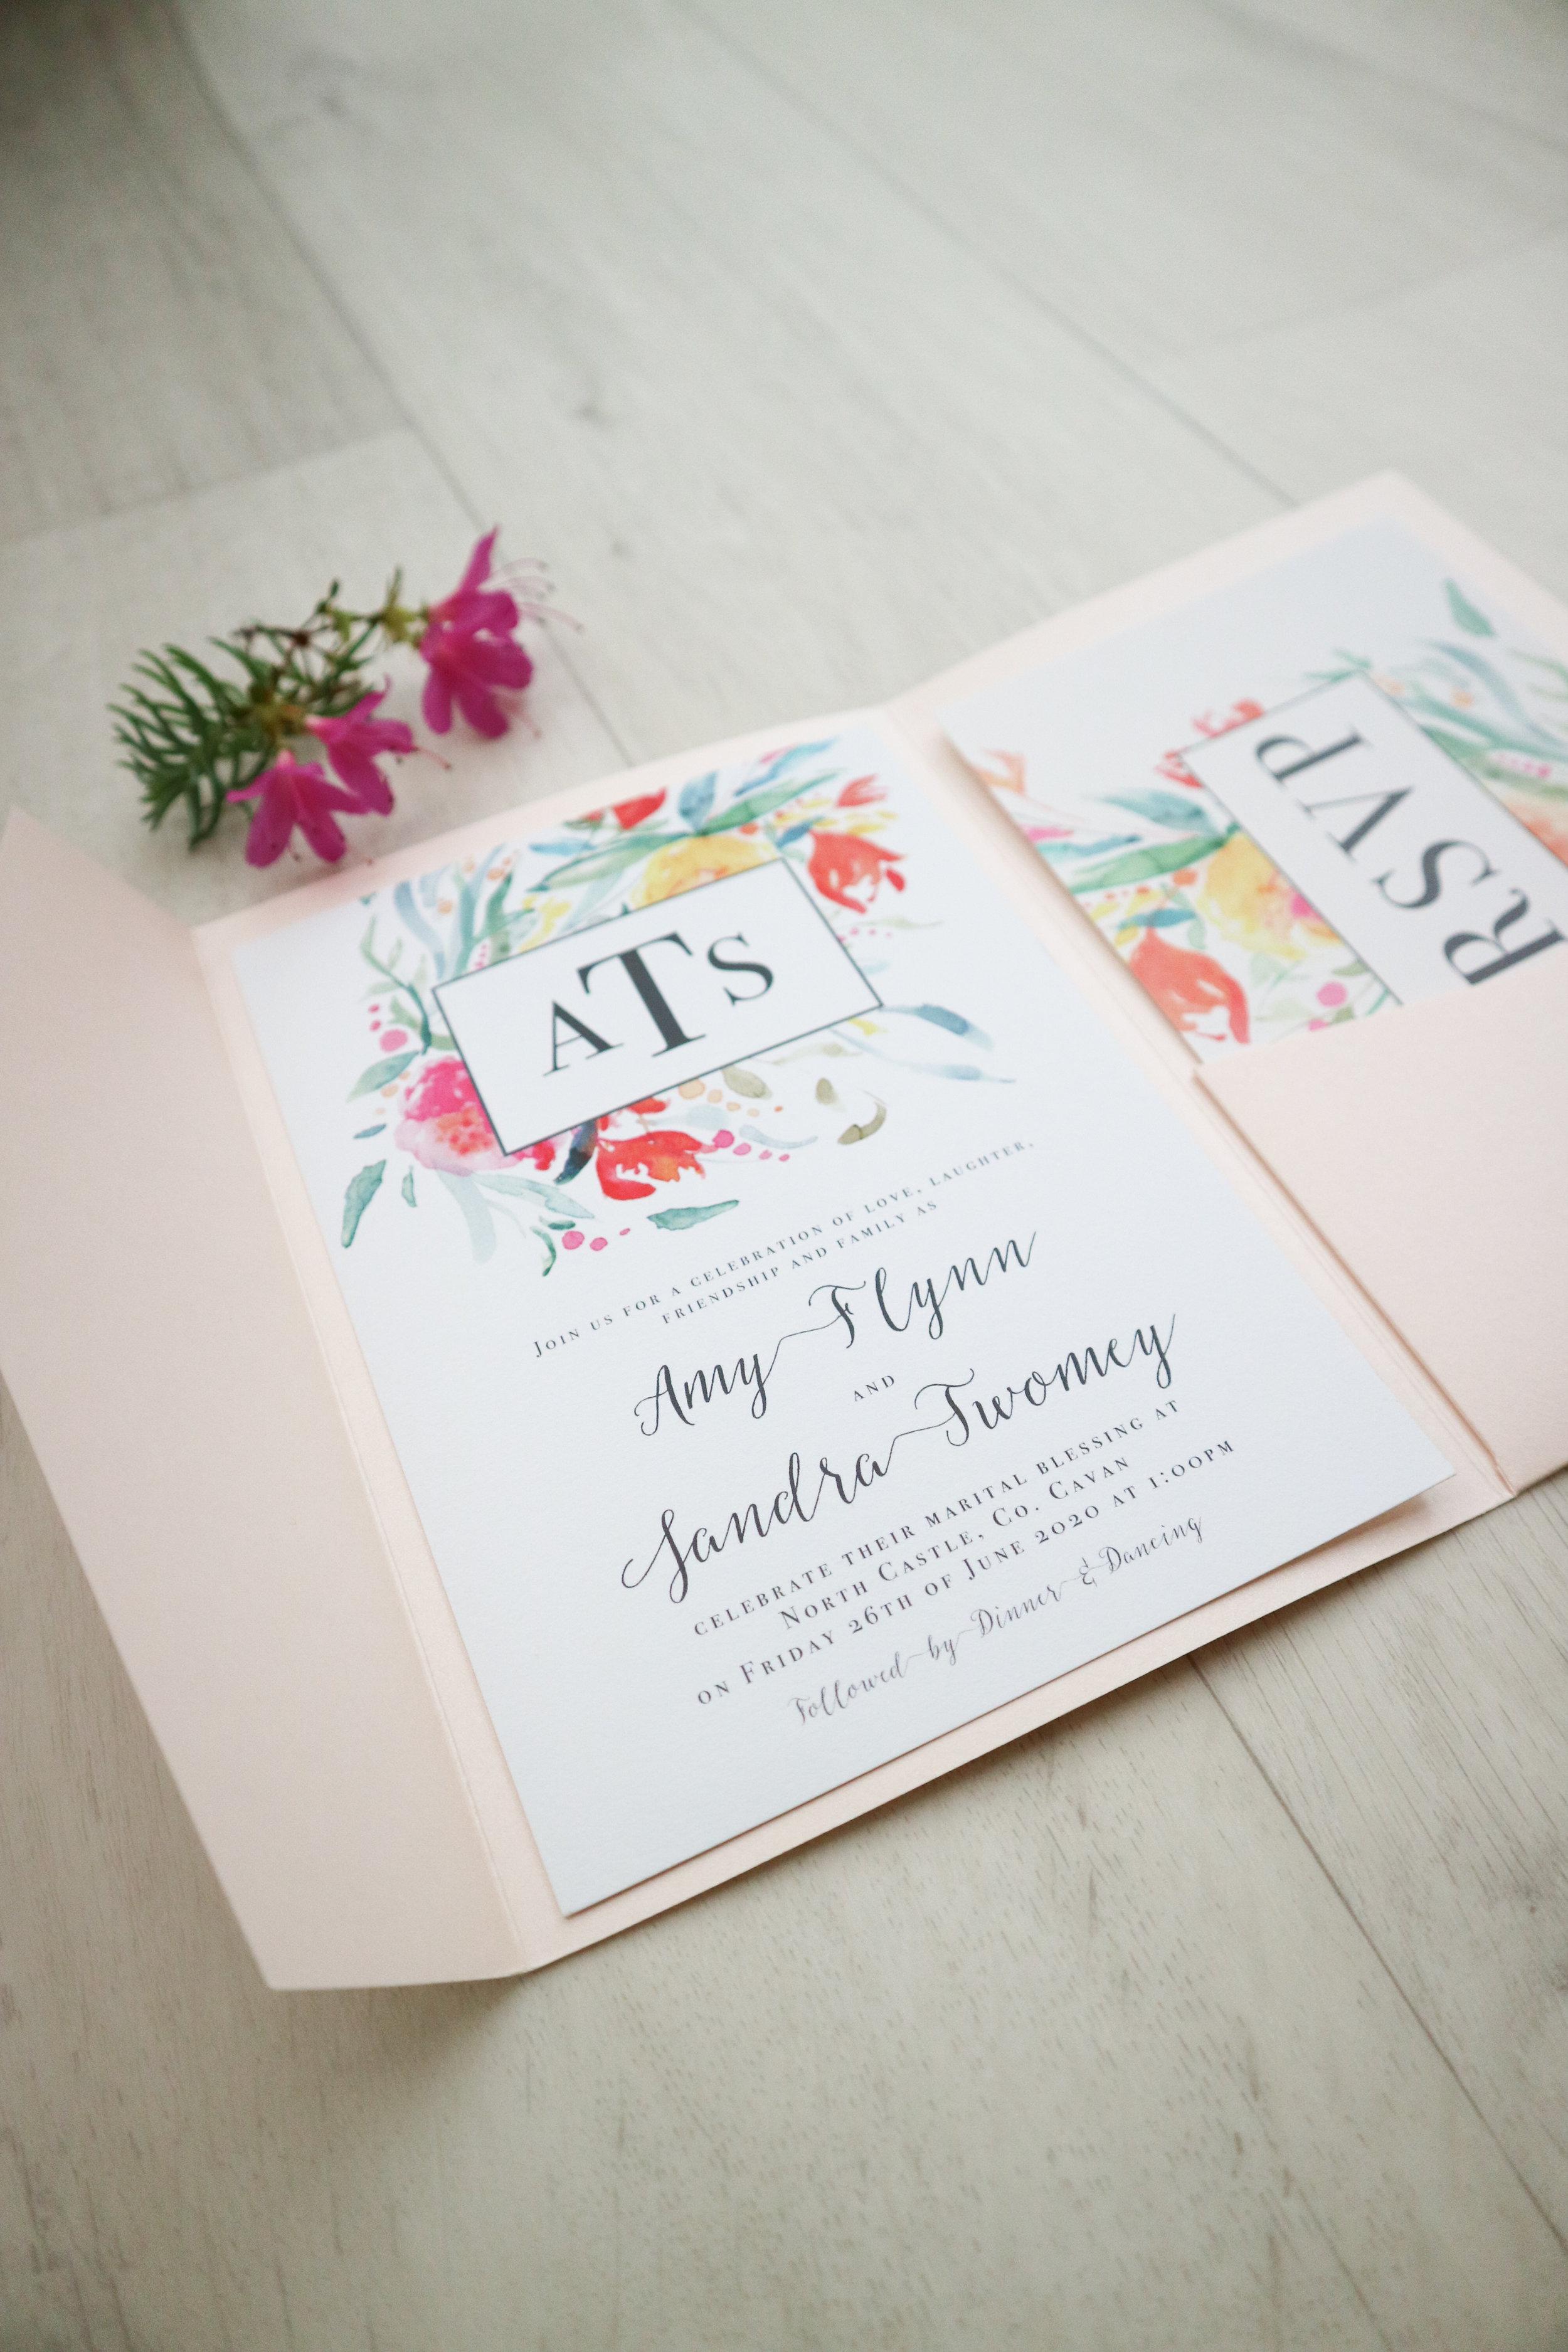 Little-Bow-Print-Wedding-Invitations-Waterford-Eden-photography-Boquet-Monogram-Confetti-9.jpg